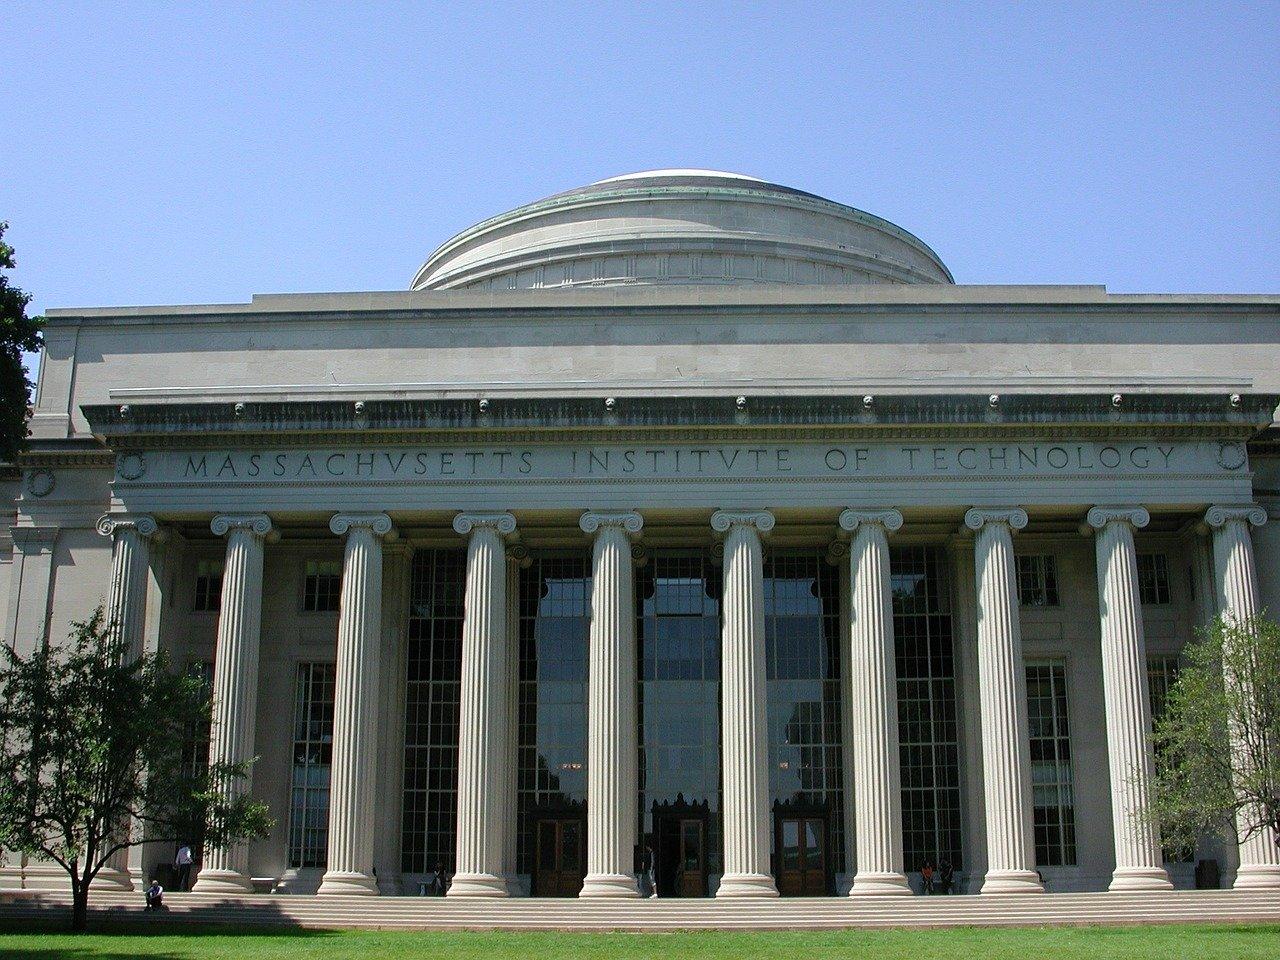 Massachusetts Institute of Technology MIT معهد ماستشوستس للتكنولوجيا